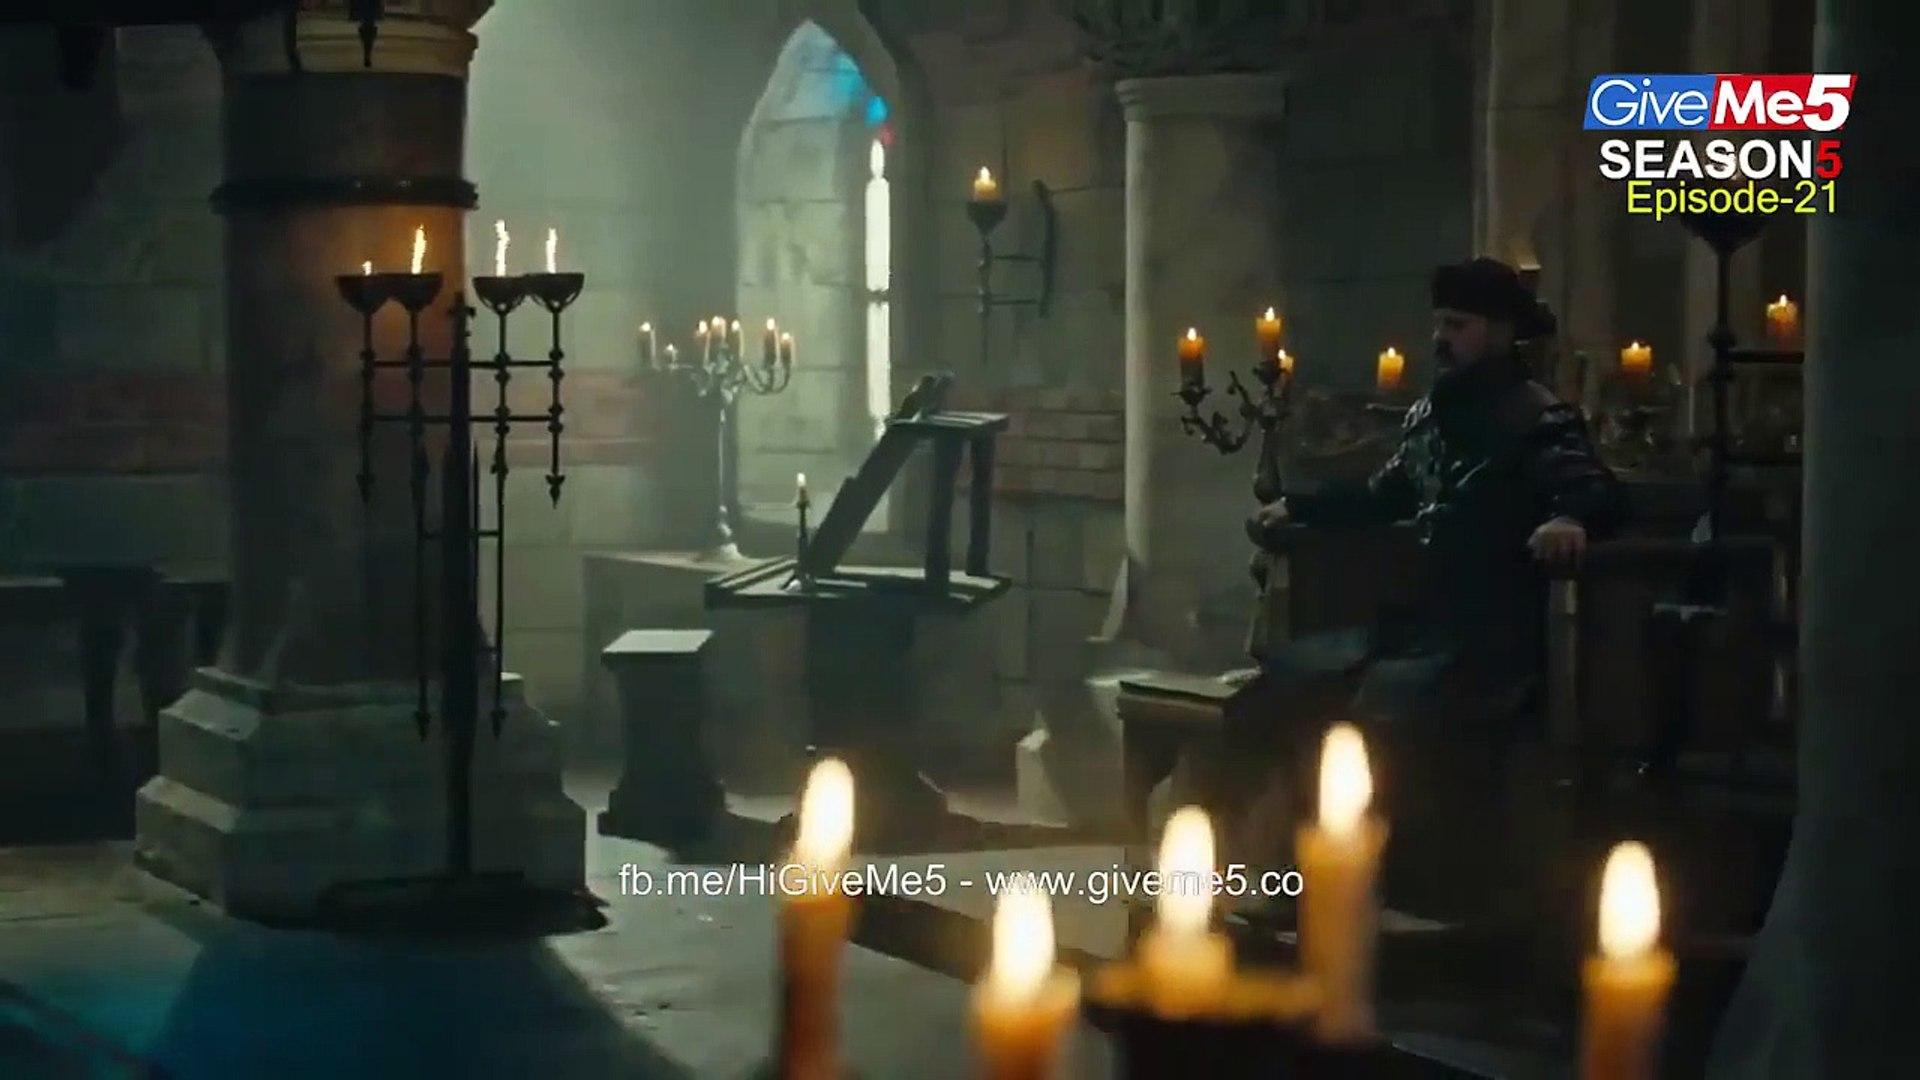 Dirilis Ertugrul Ghazi Season 5 in Urdu Subtitle Episode 21 & 22